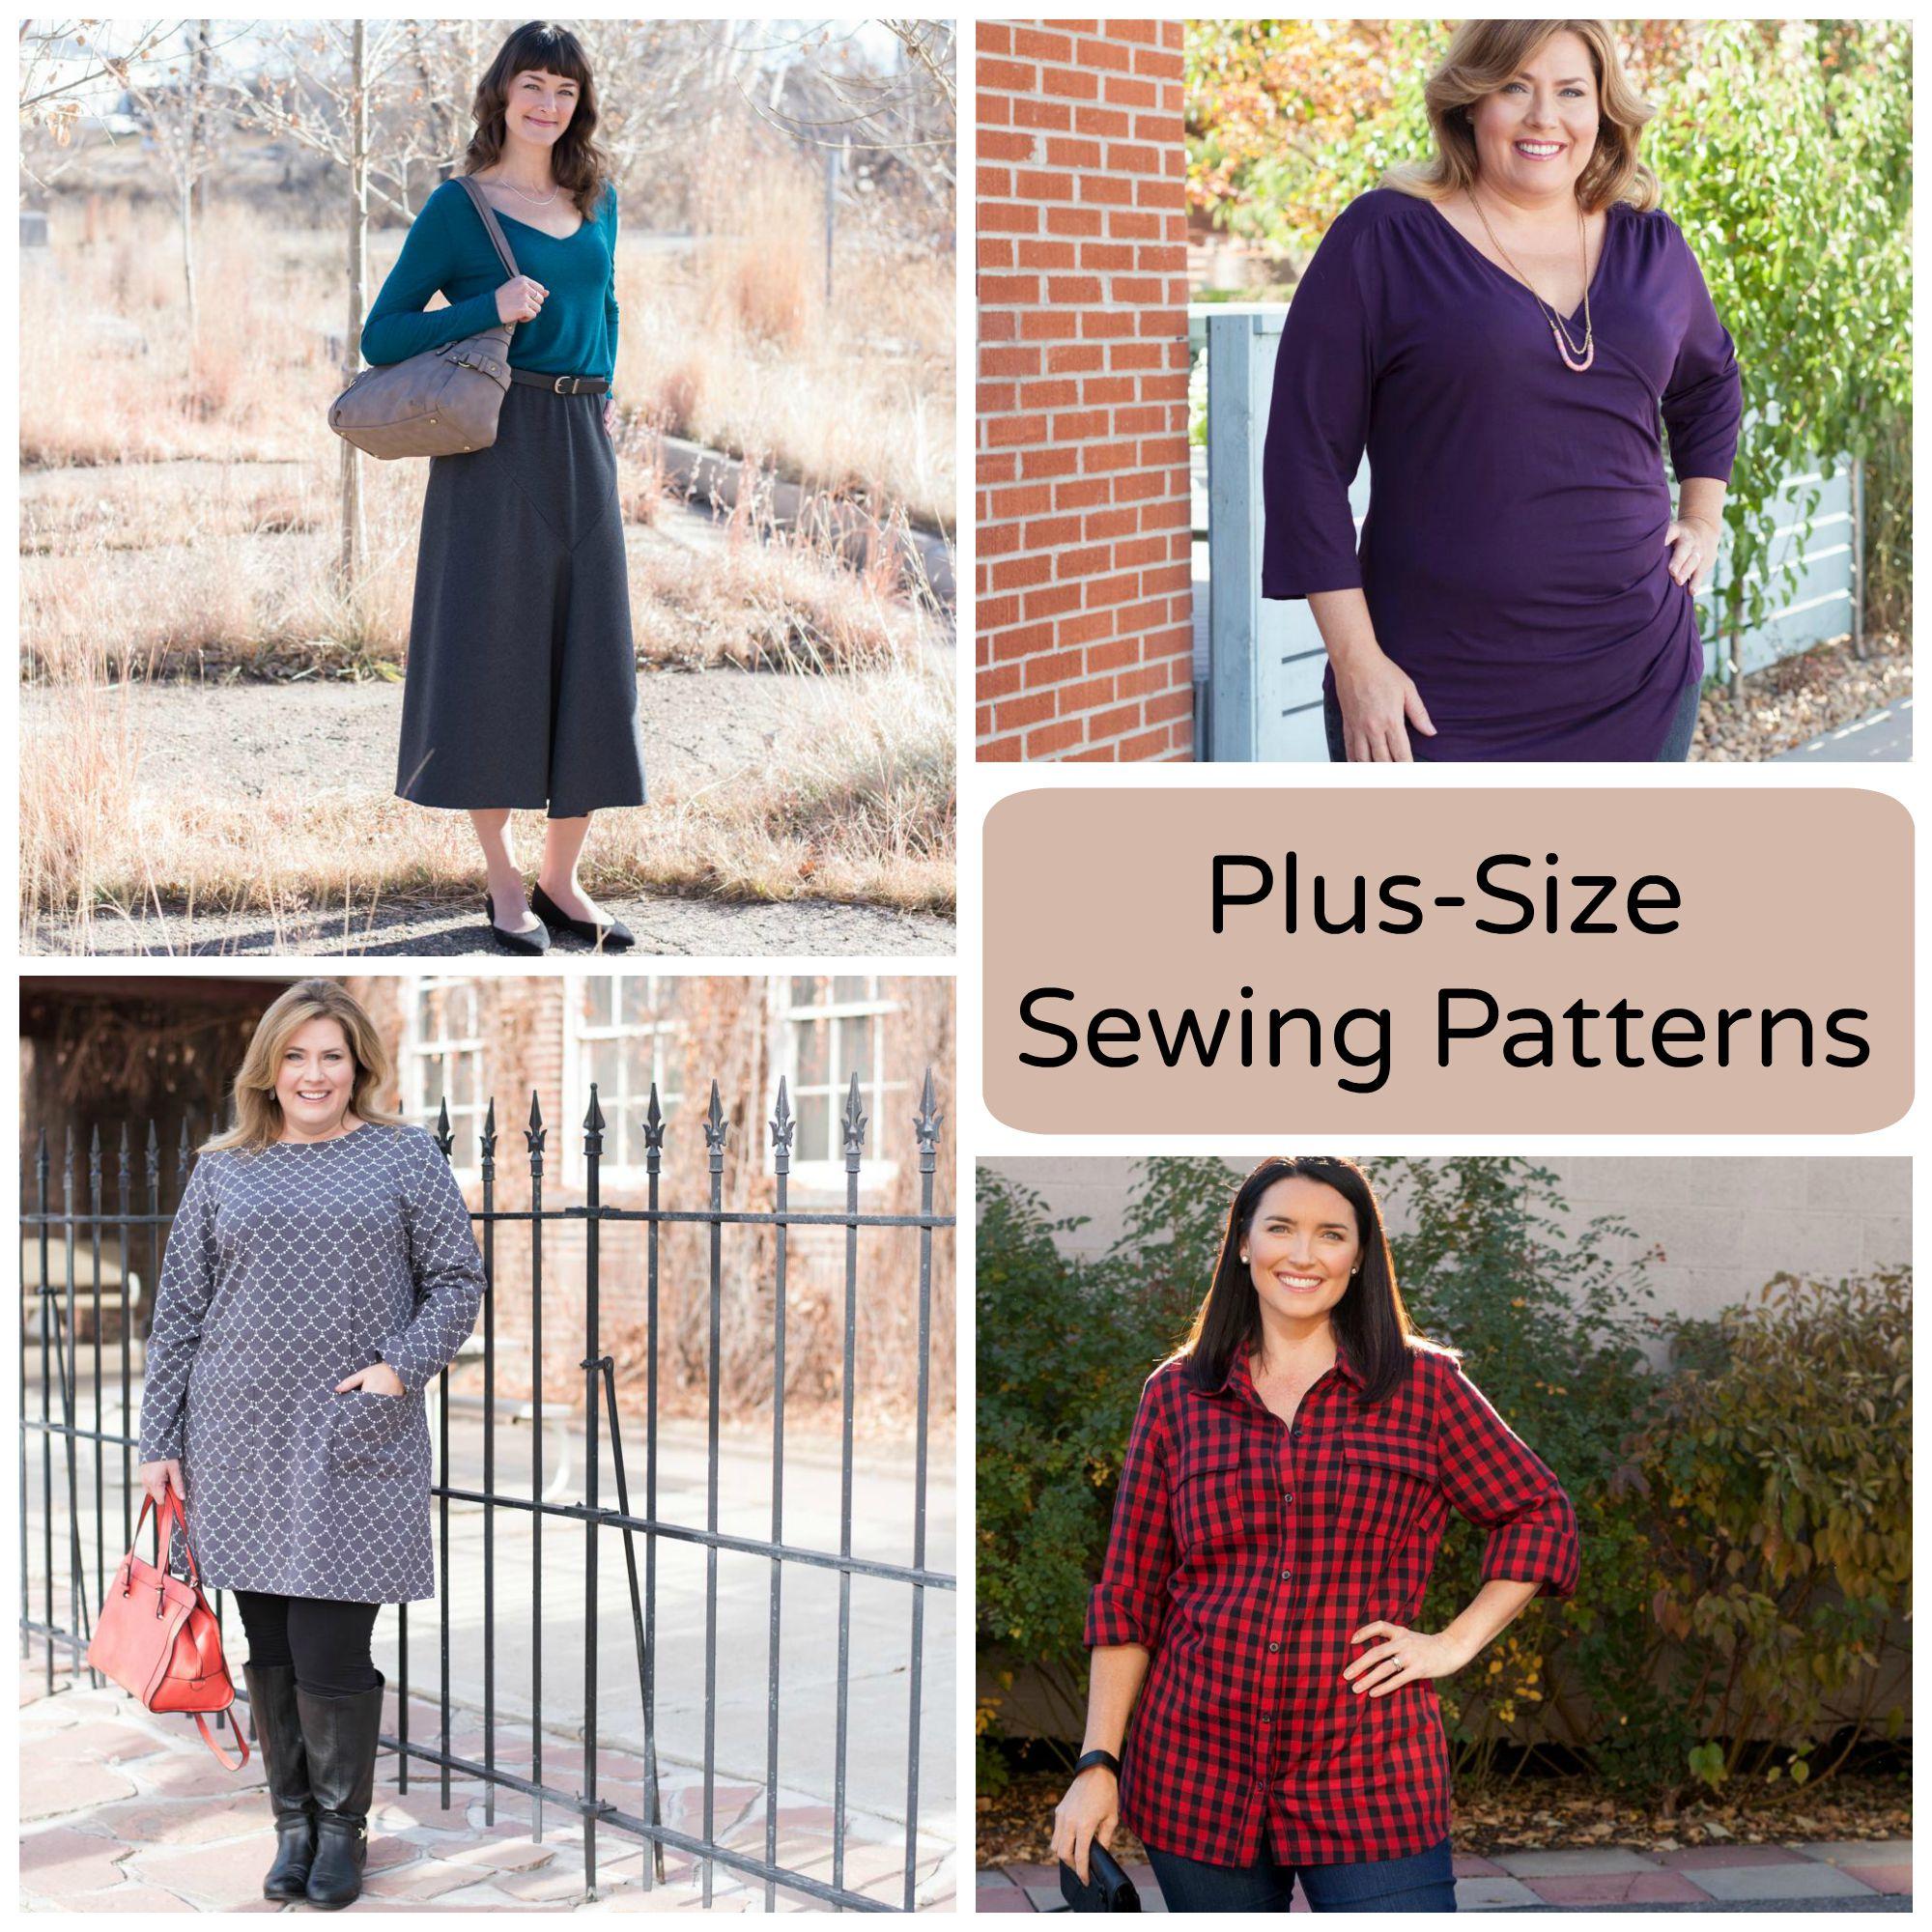 Plus-Size Sewing Patterns